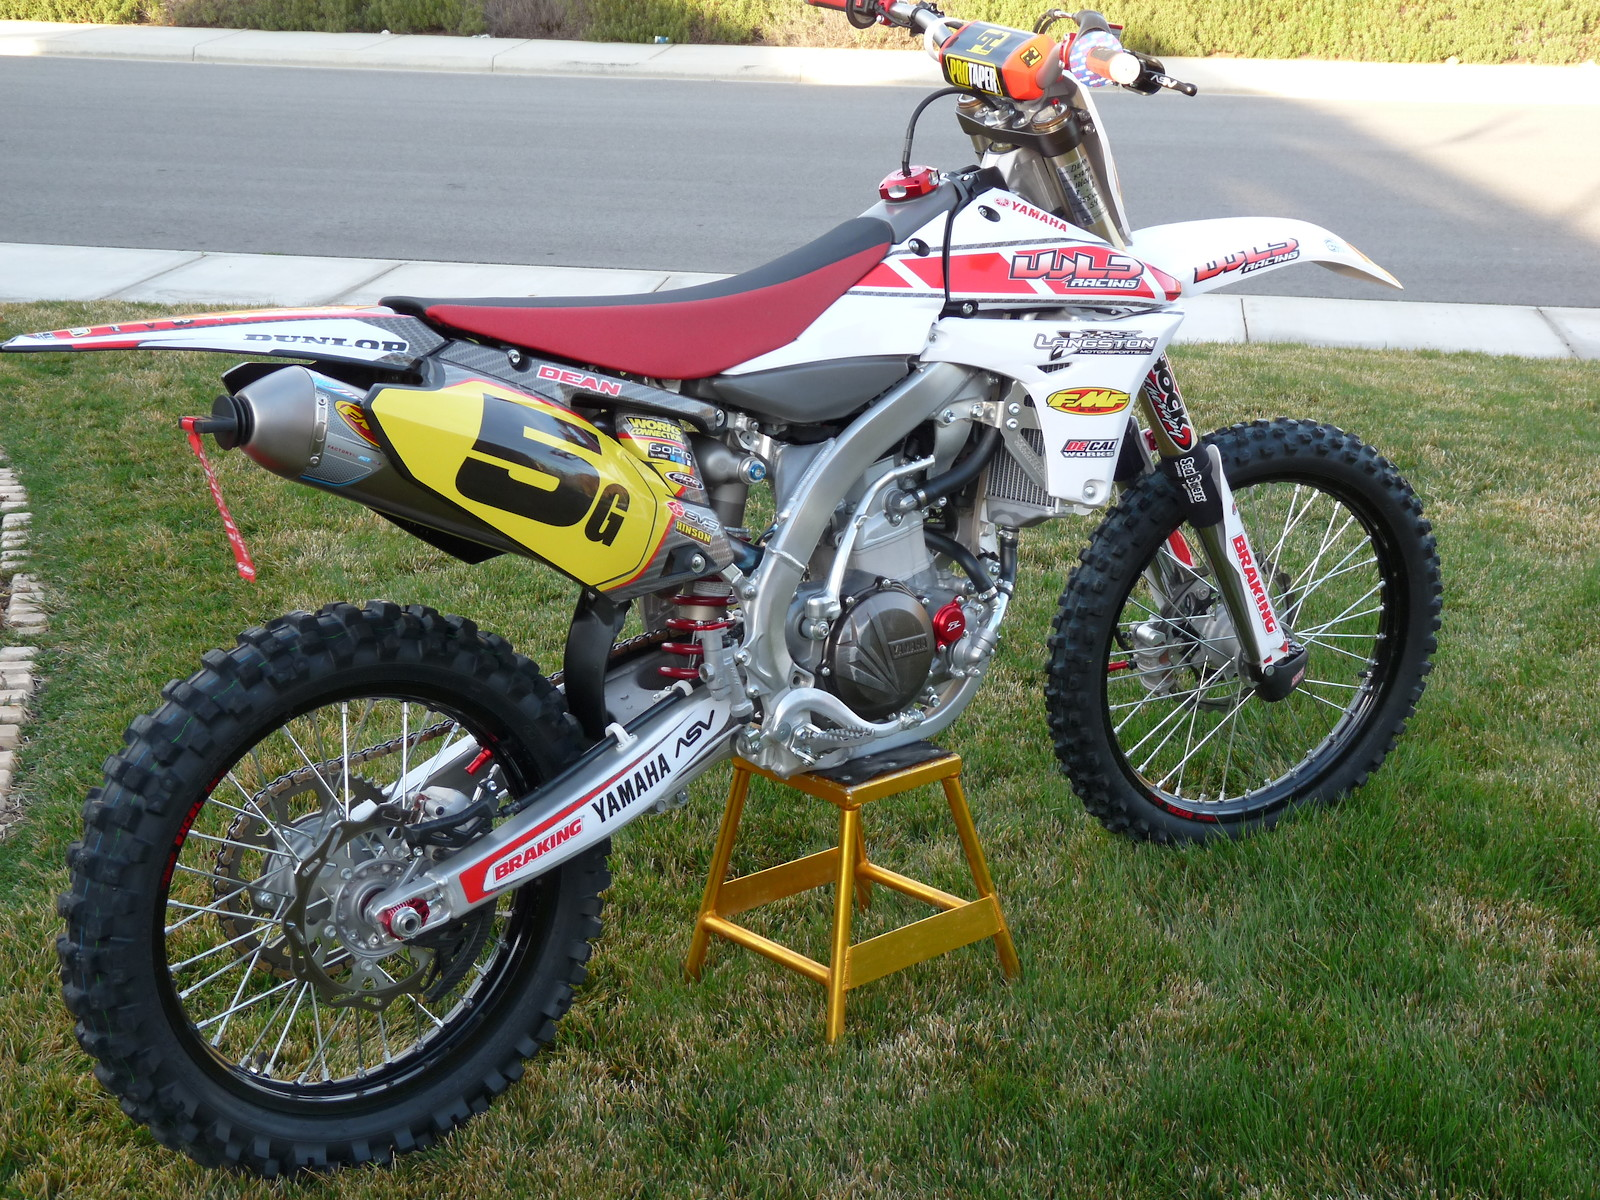 P1230521 - WLD - Motocross Pictures - Vital MX